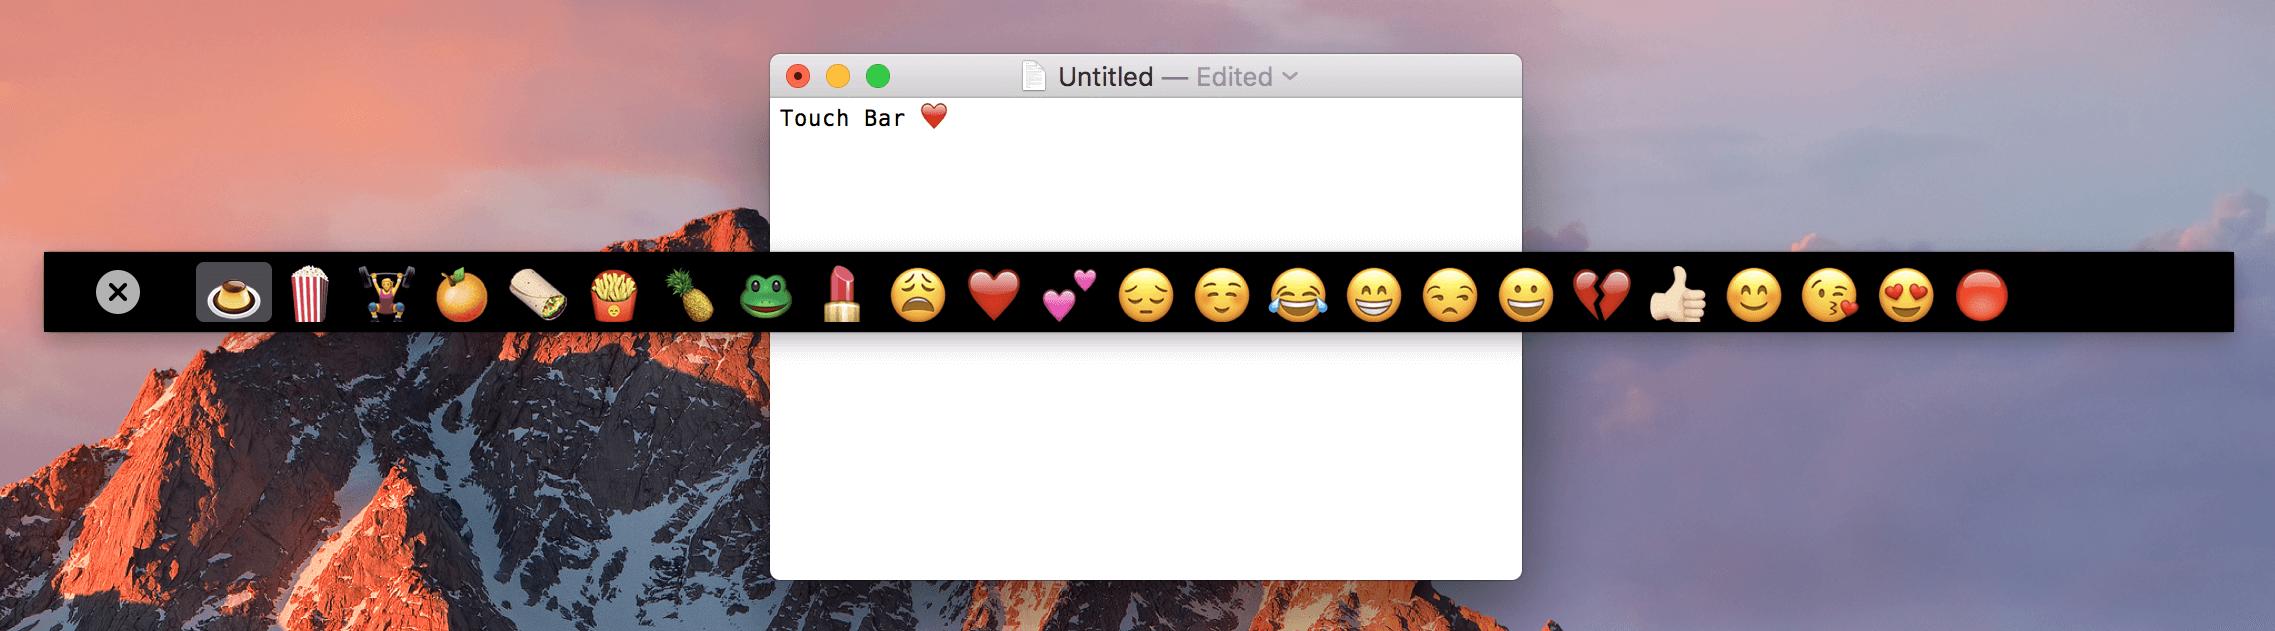 touch bar demo emoji